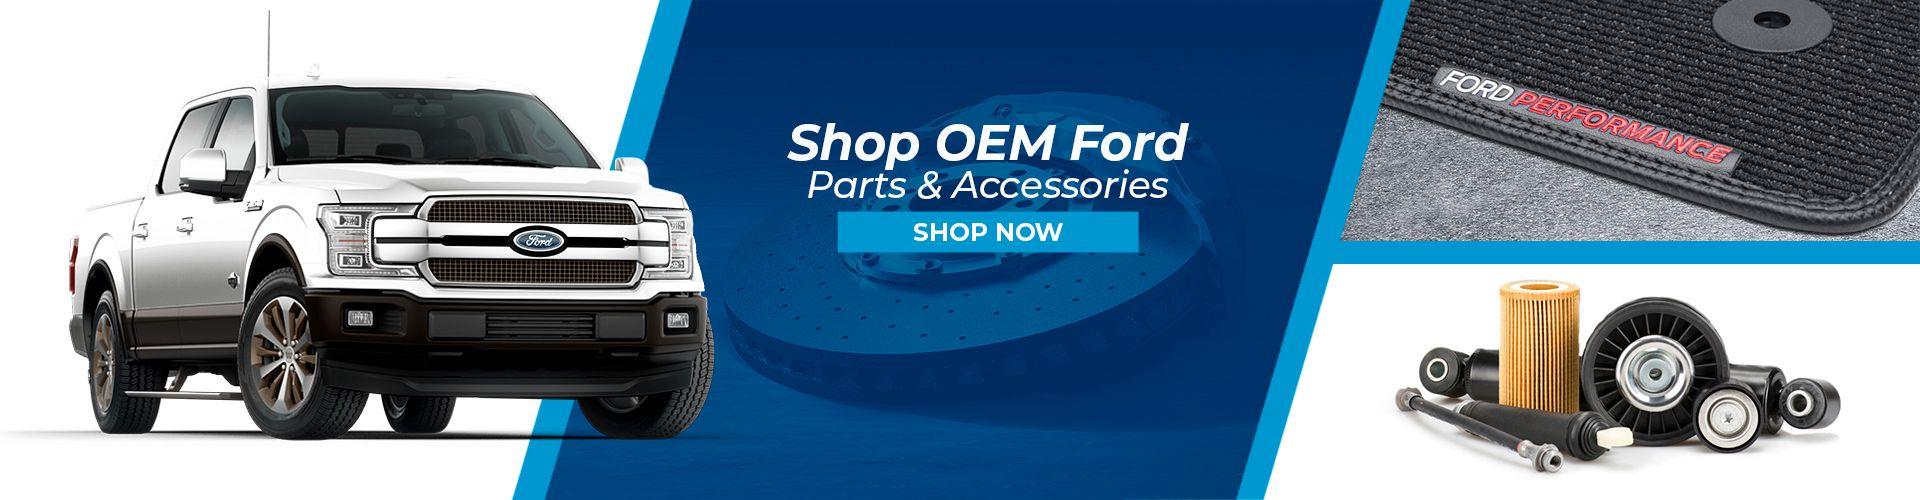 Shop OEM Ford Parts